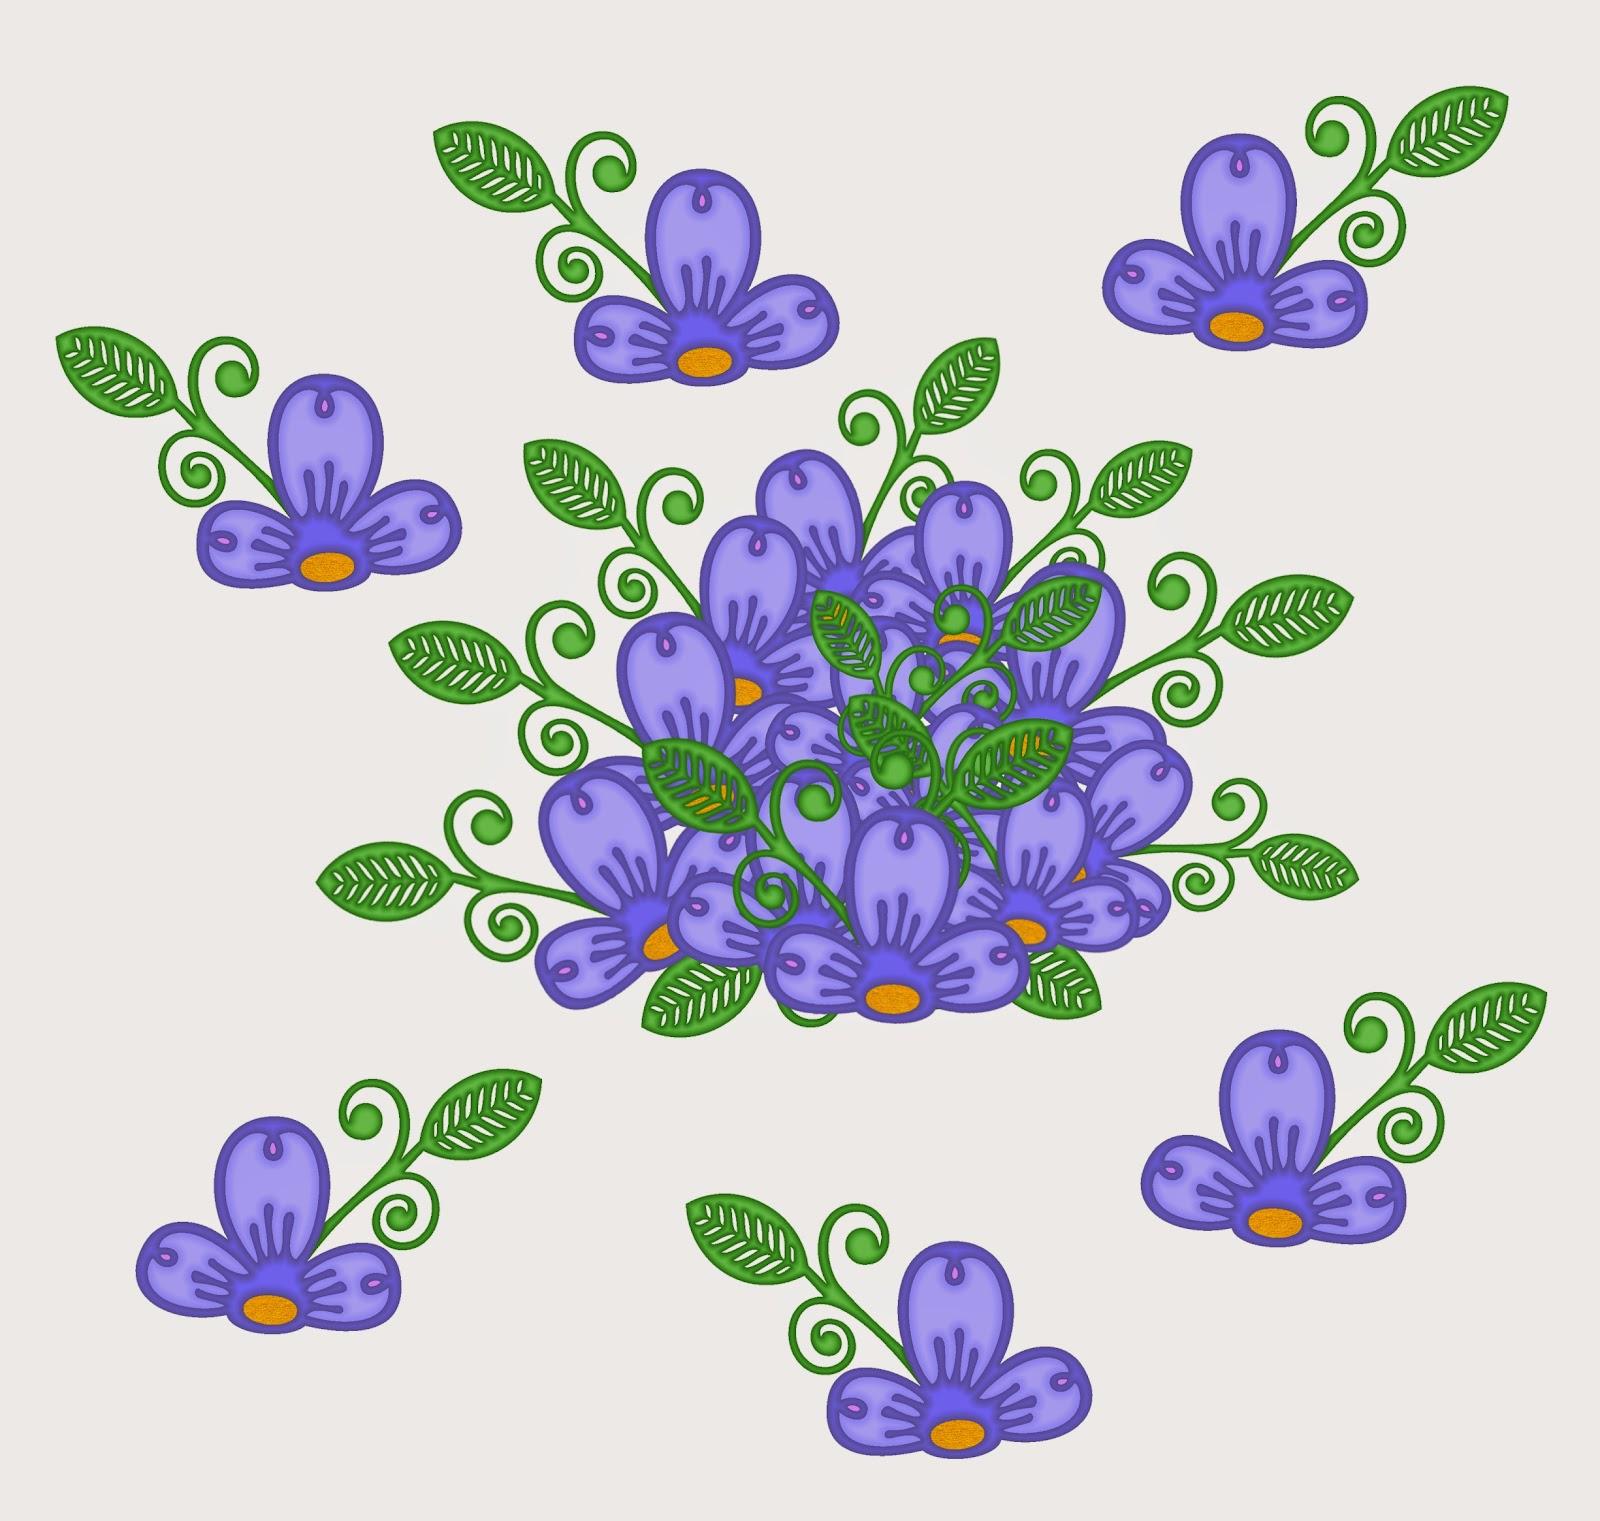 Clipart Blume 5